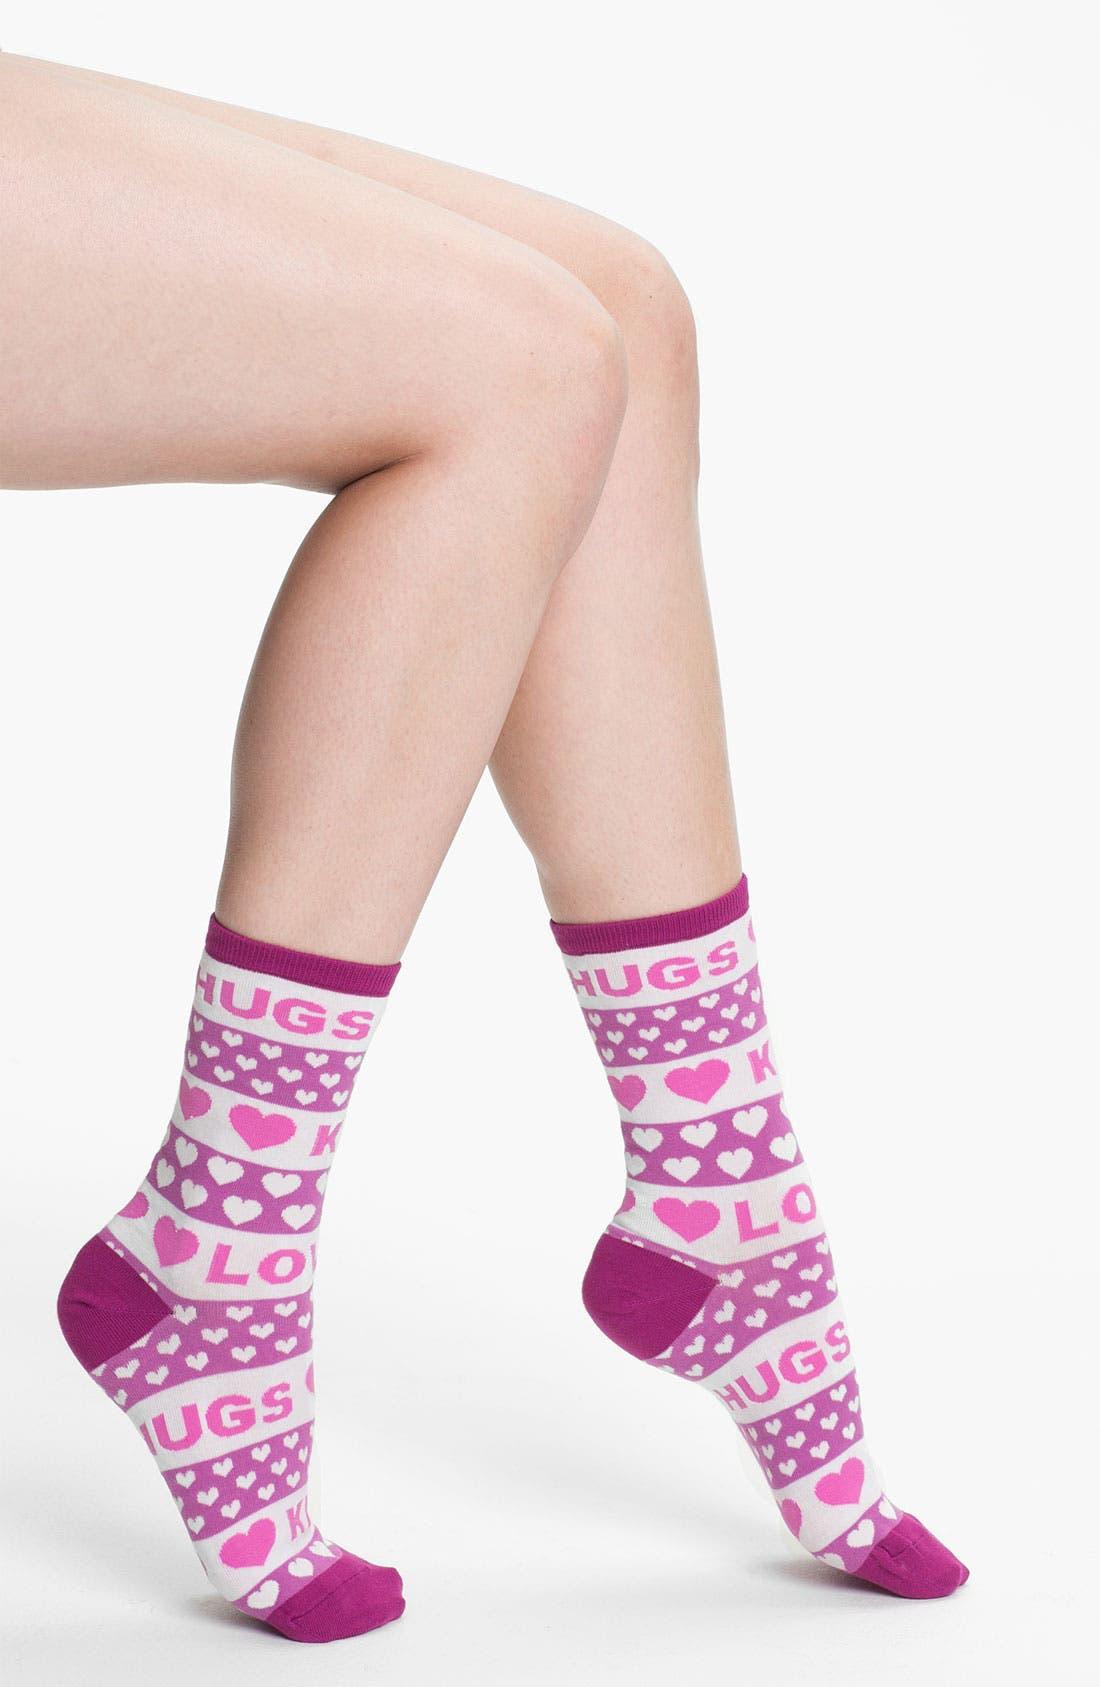 Alternate Image 1 Selected - Hot Sox 'Hugs & Kisses' Socks